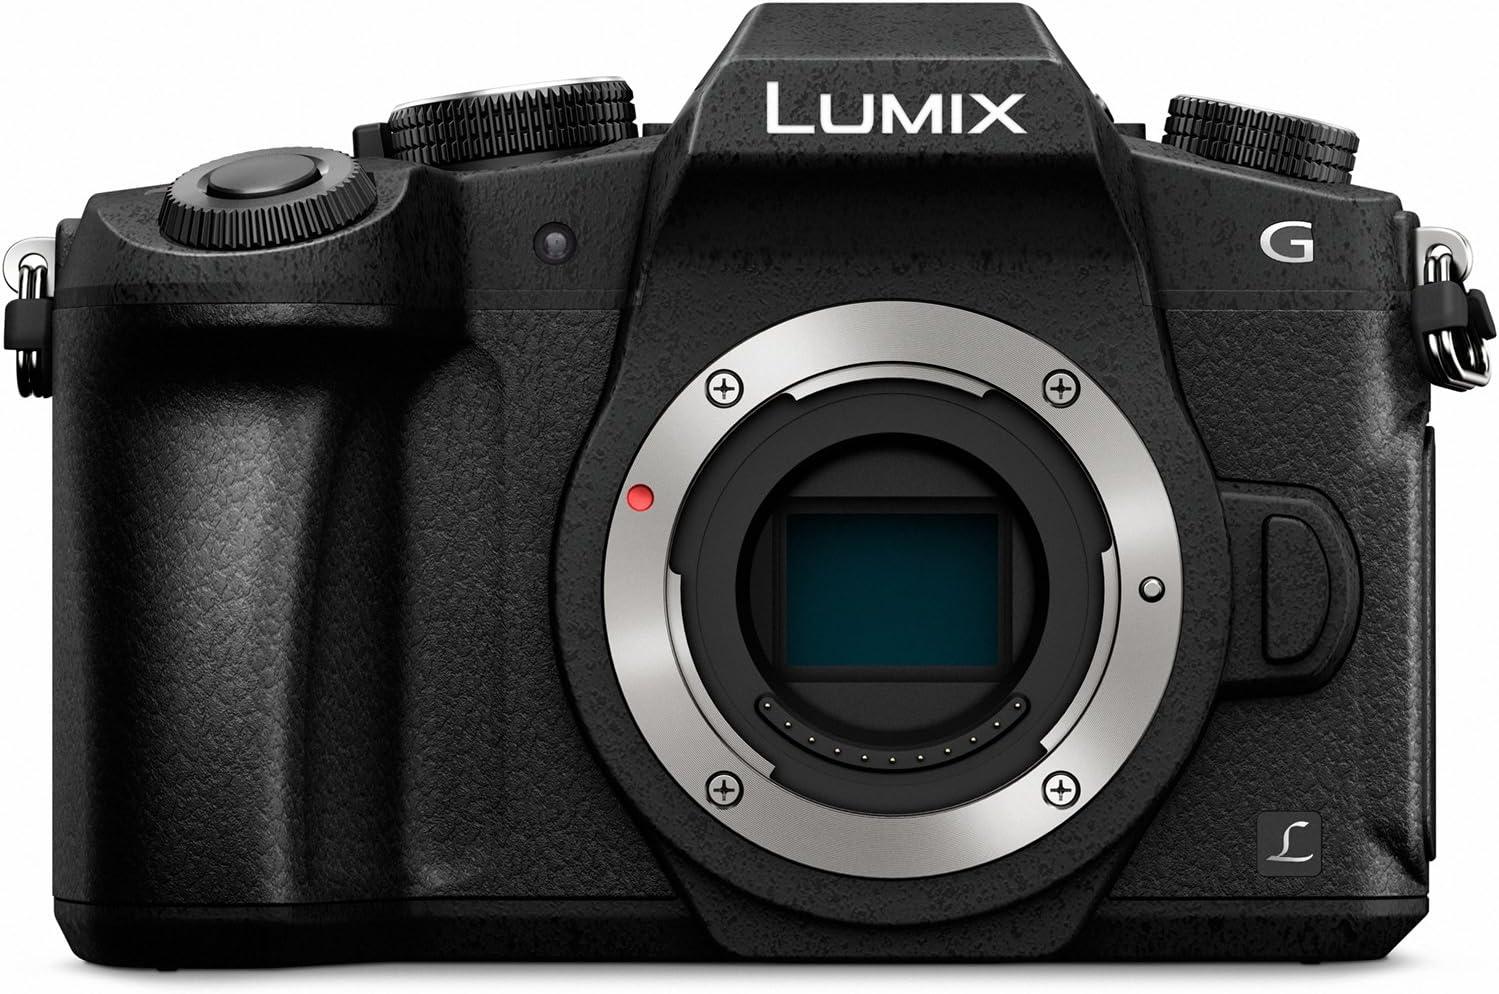 Amazon Com Panasonic Lumix G85 Body 4k Mirrorless Camera Inbody Dual I S 2 0 16 Megapixels 3 Inch Touch Lcd Dmc G85kbody Usa Black Camera Photo